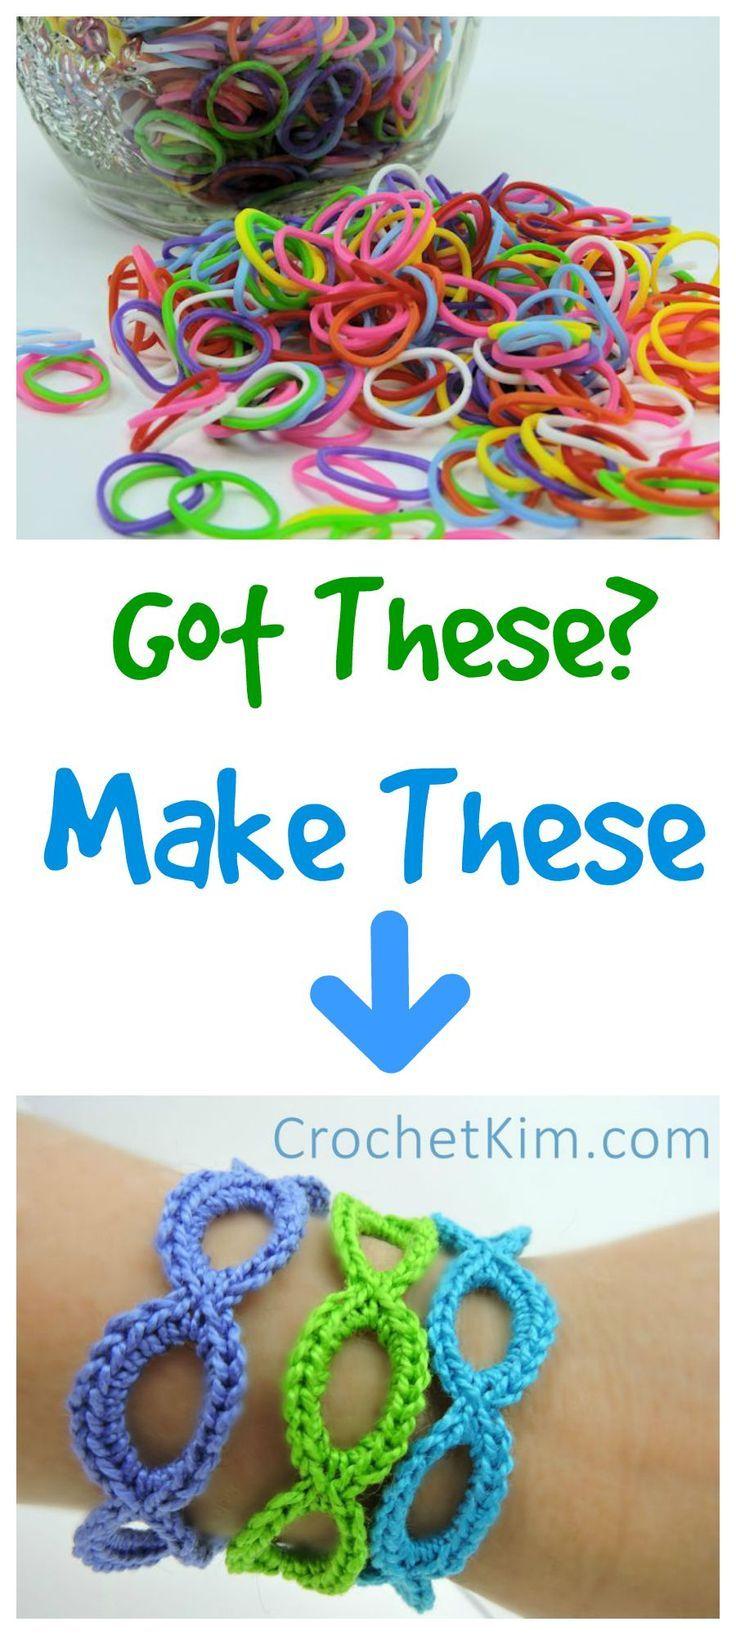 Stretchy Bracelets Made Loom Rubber Bands | free crochet pattern at CrochetKim